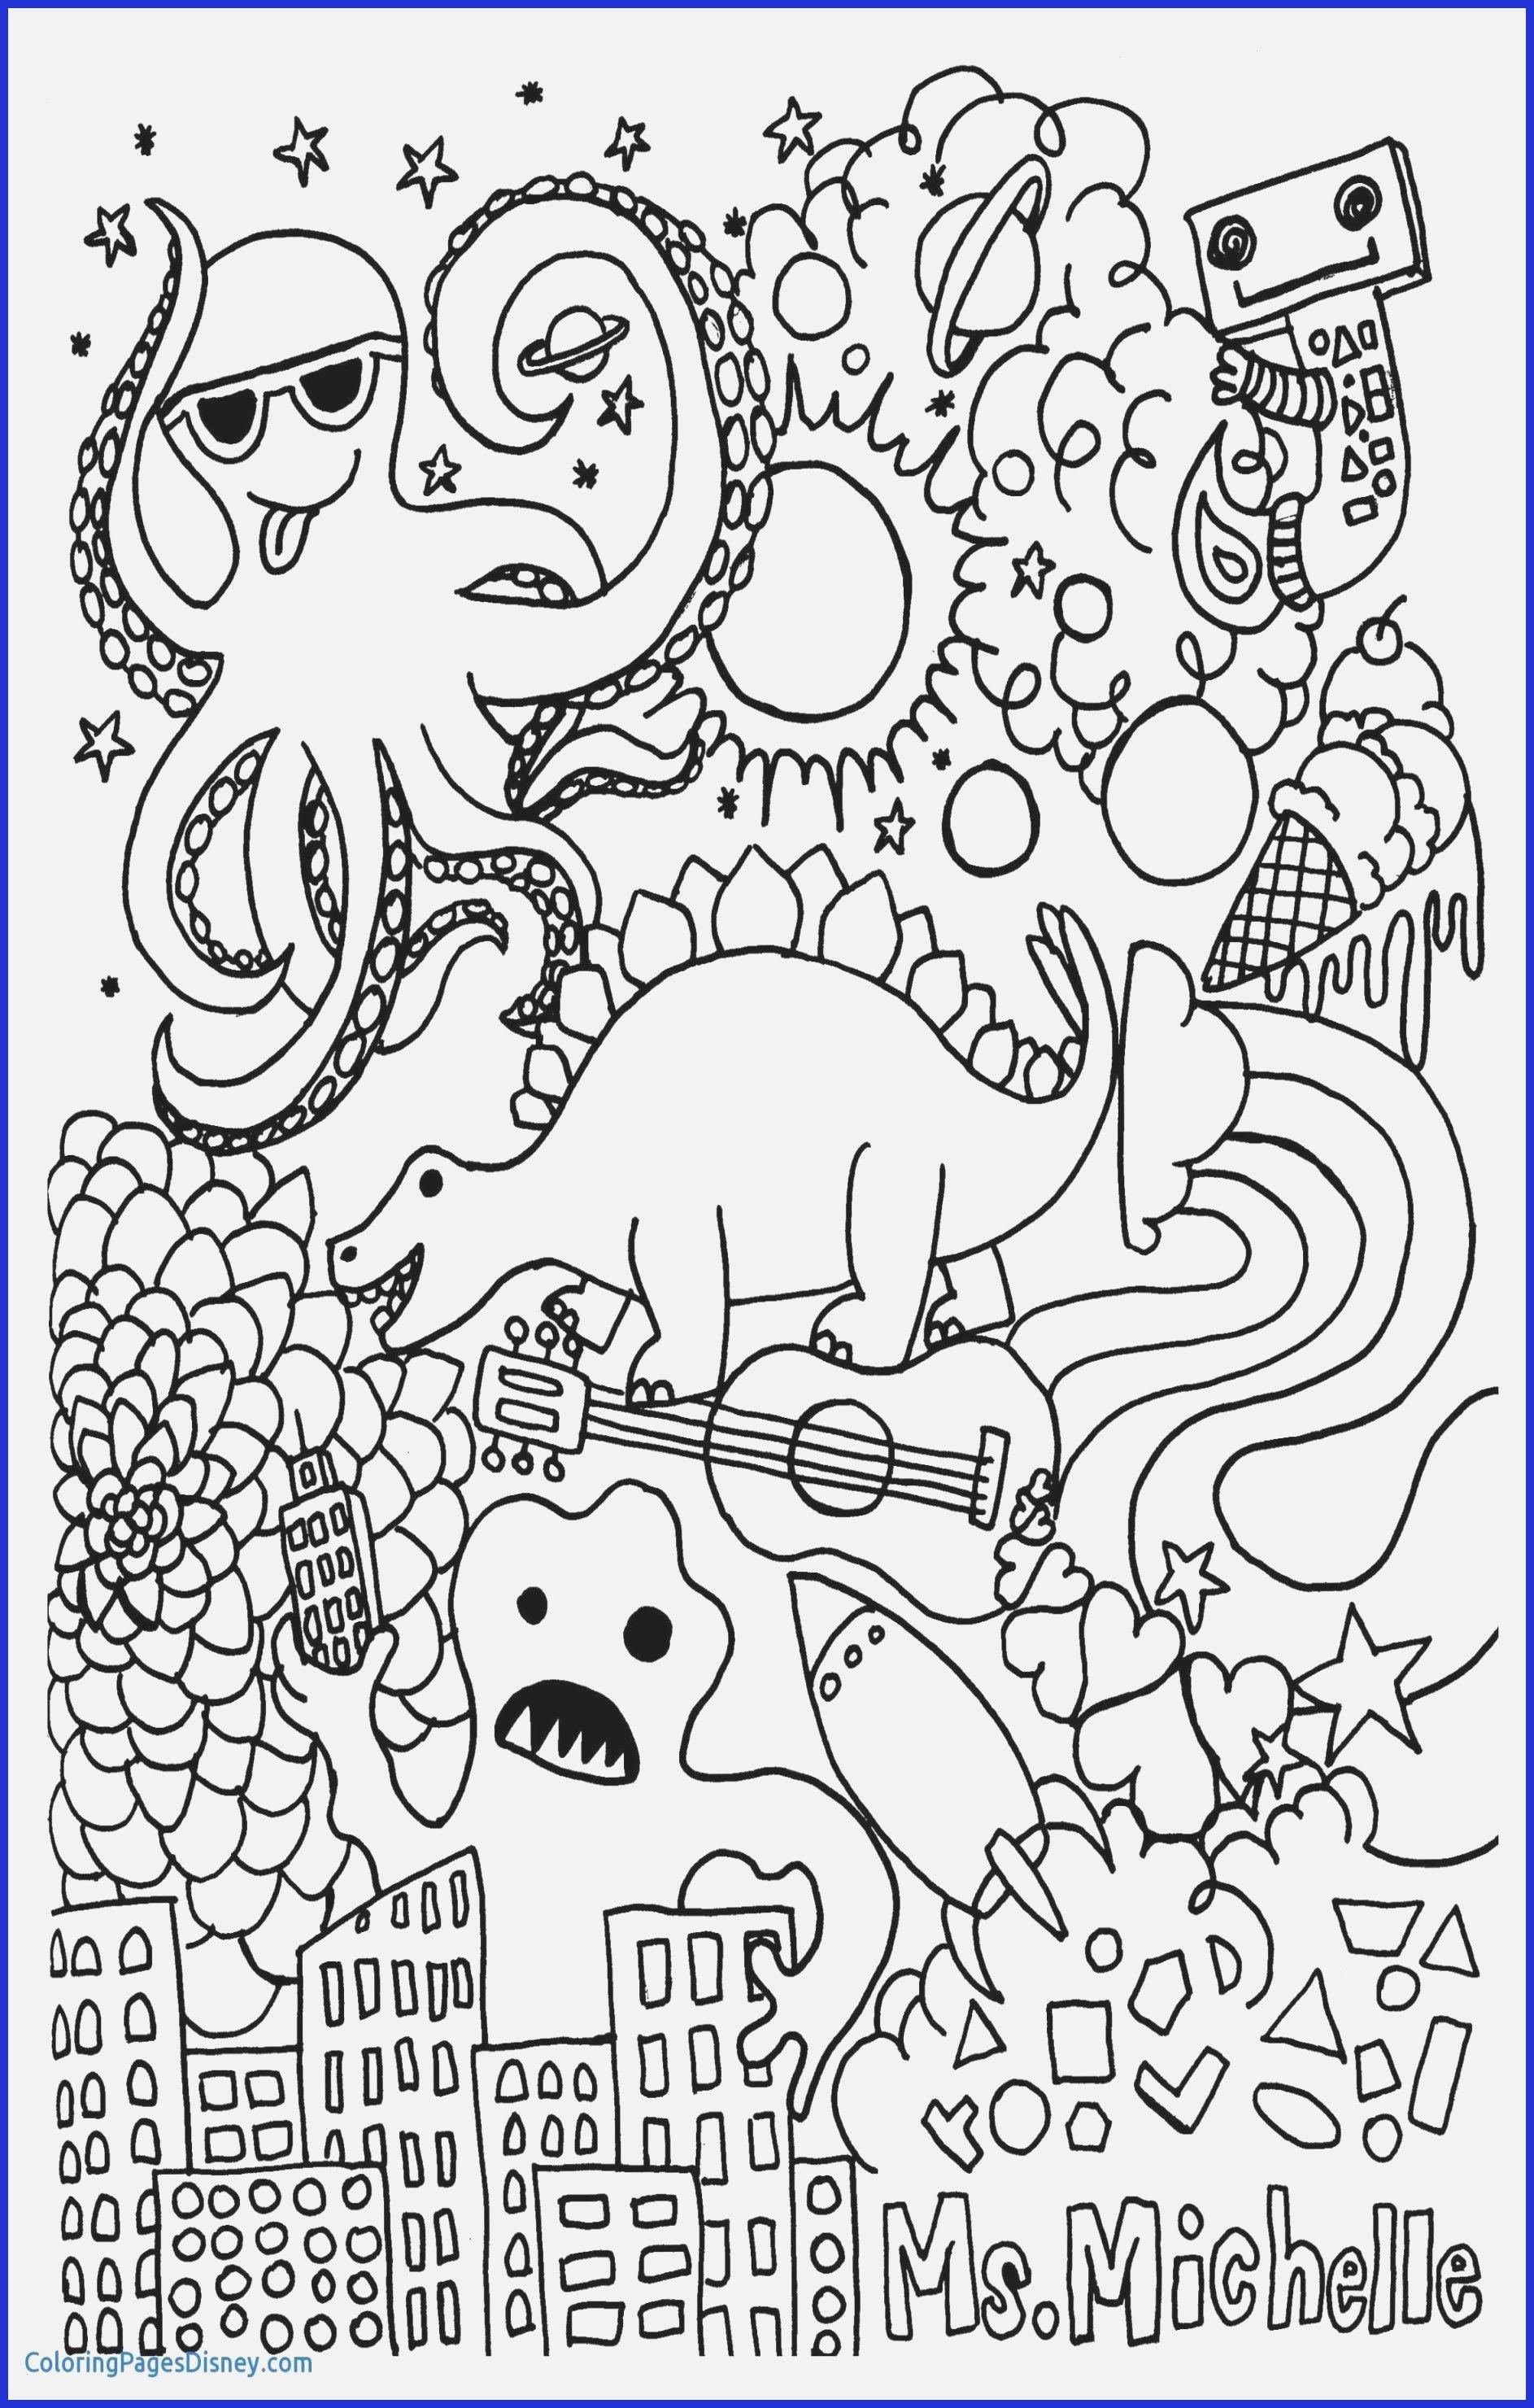 Neu Ausmalbilder Happy Birthday Malvorlagen Malvorlagenfurkinder Malvorlagenfurerwachsene Herbst Ausmalvorlagen Alphabet Malvorlagen Malvorlagen